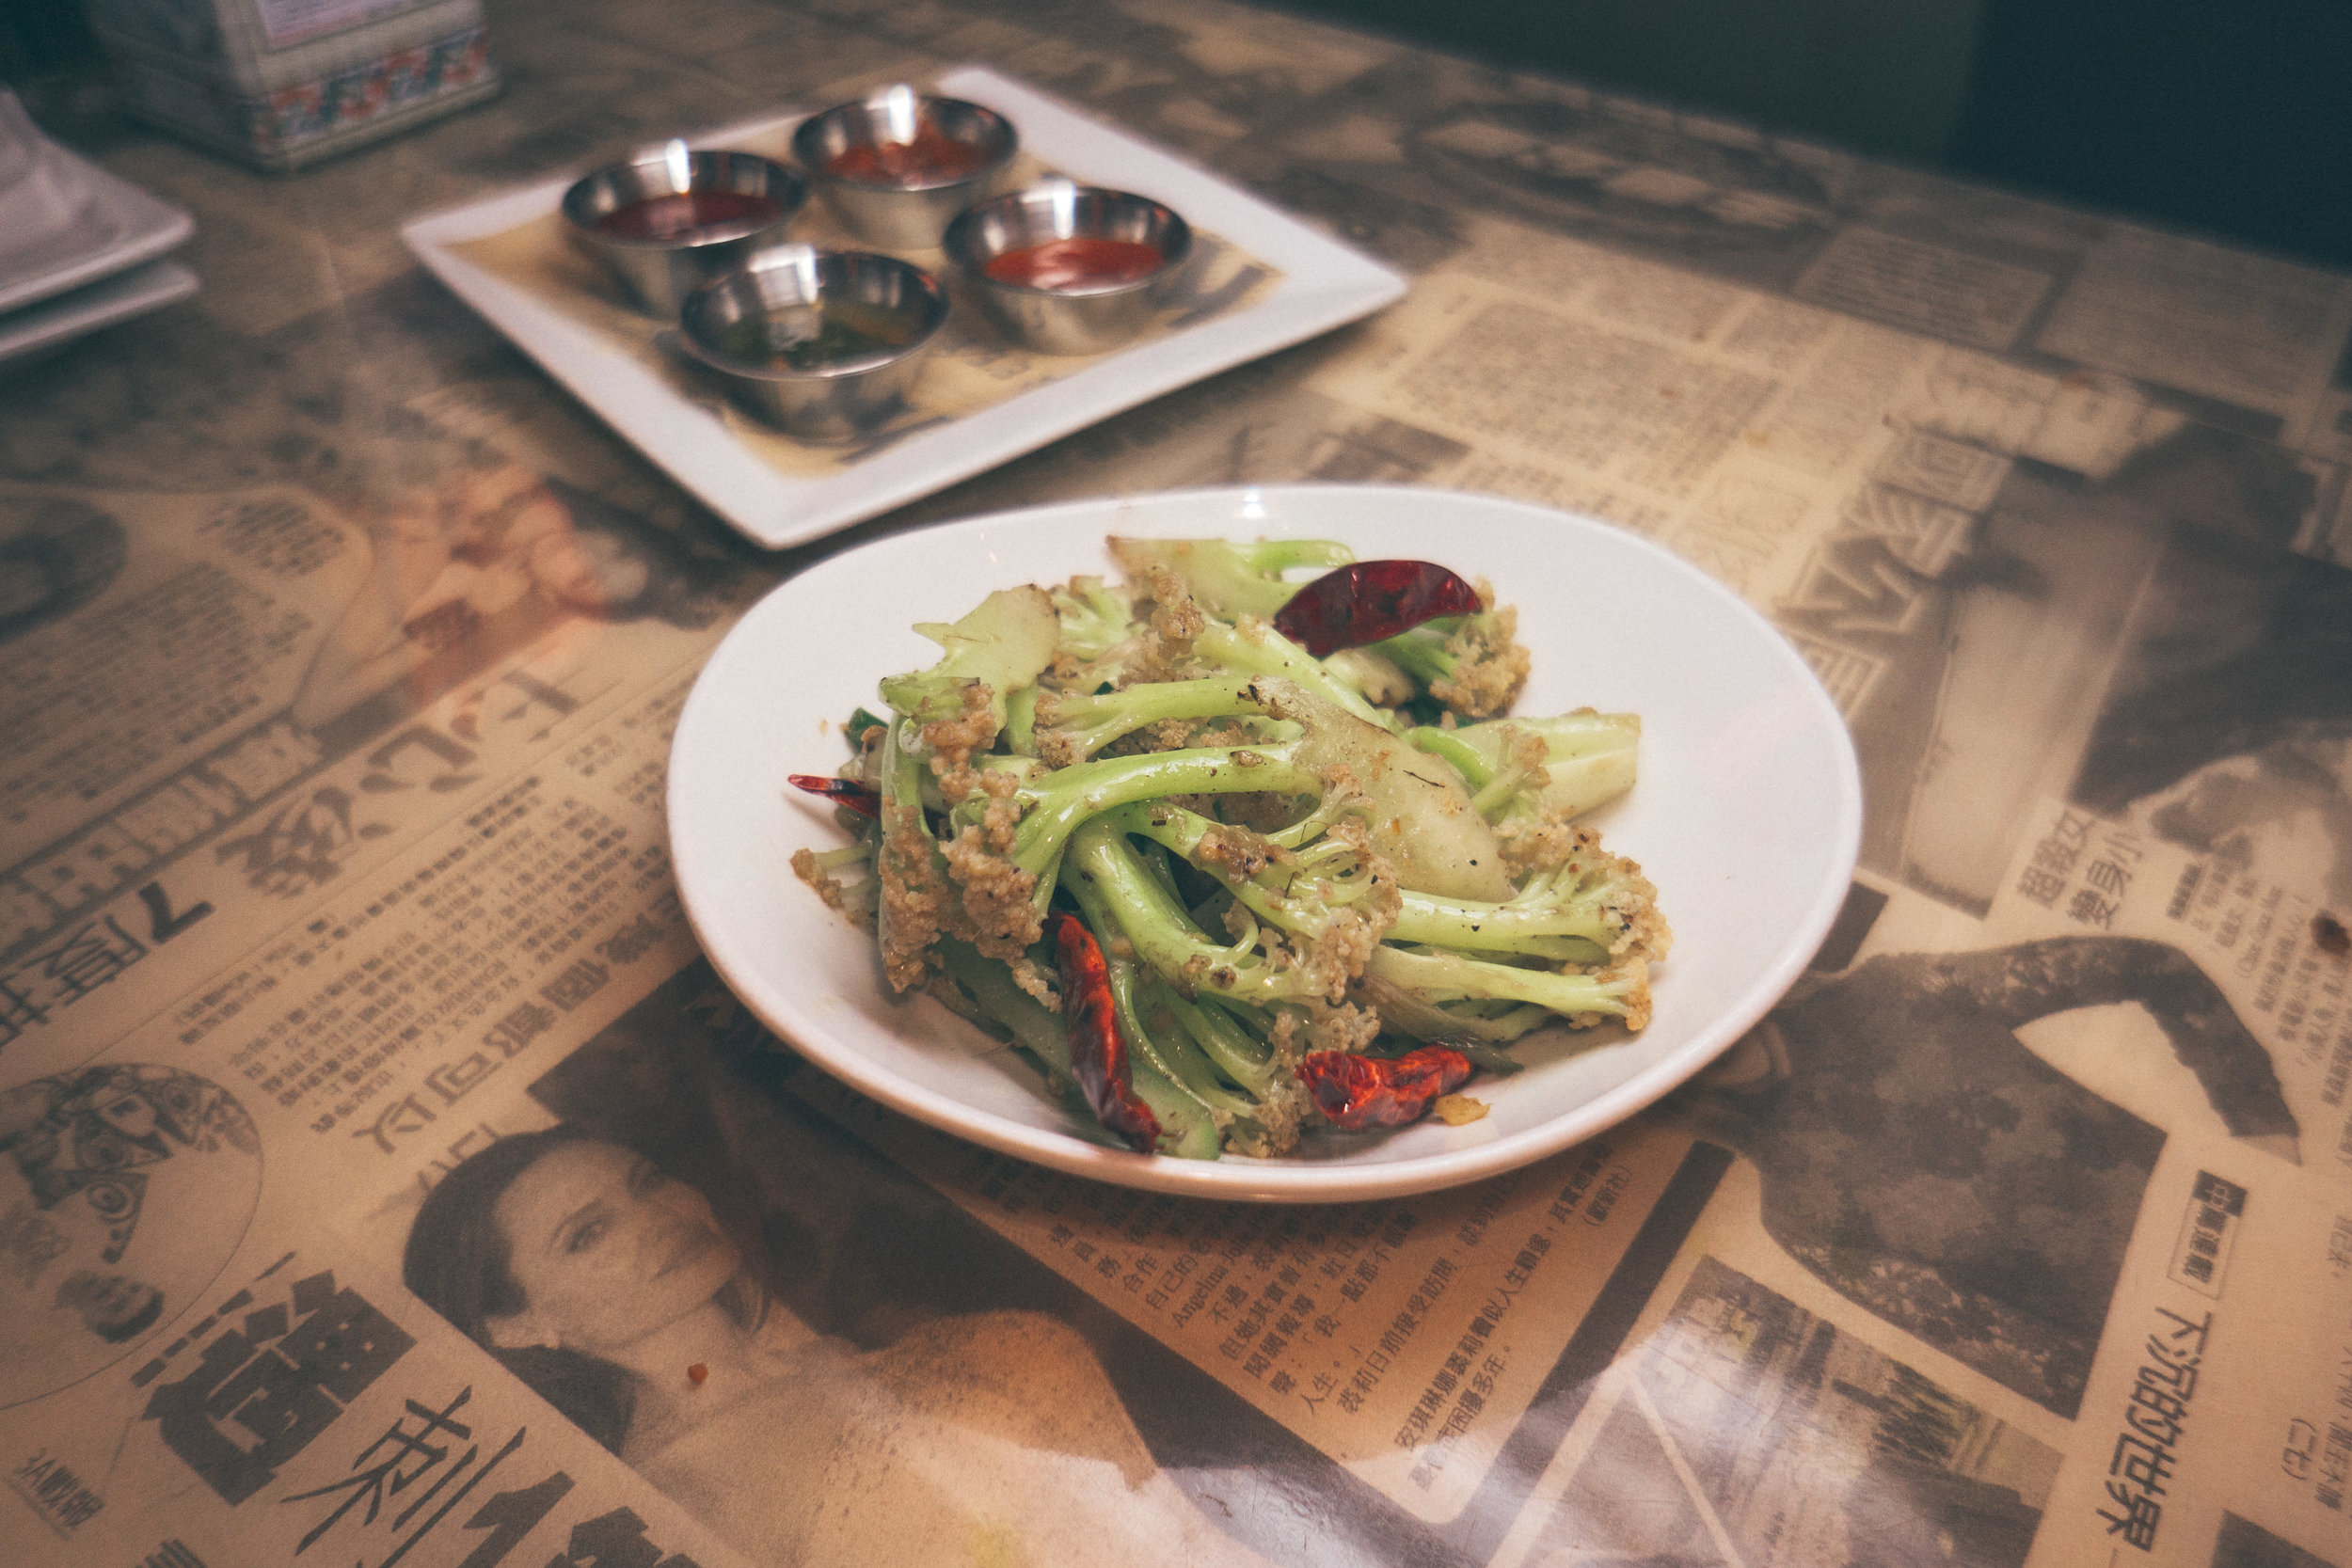 "'Dry Pot""' Caulilini: Caulilini tossed with celery, spring onions, red pepper & Szechuan peppercorn"